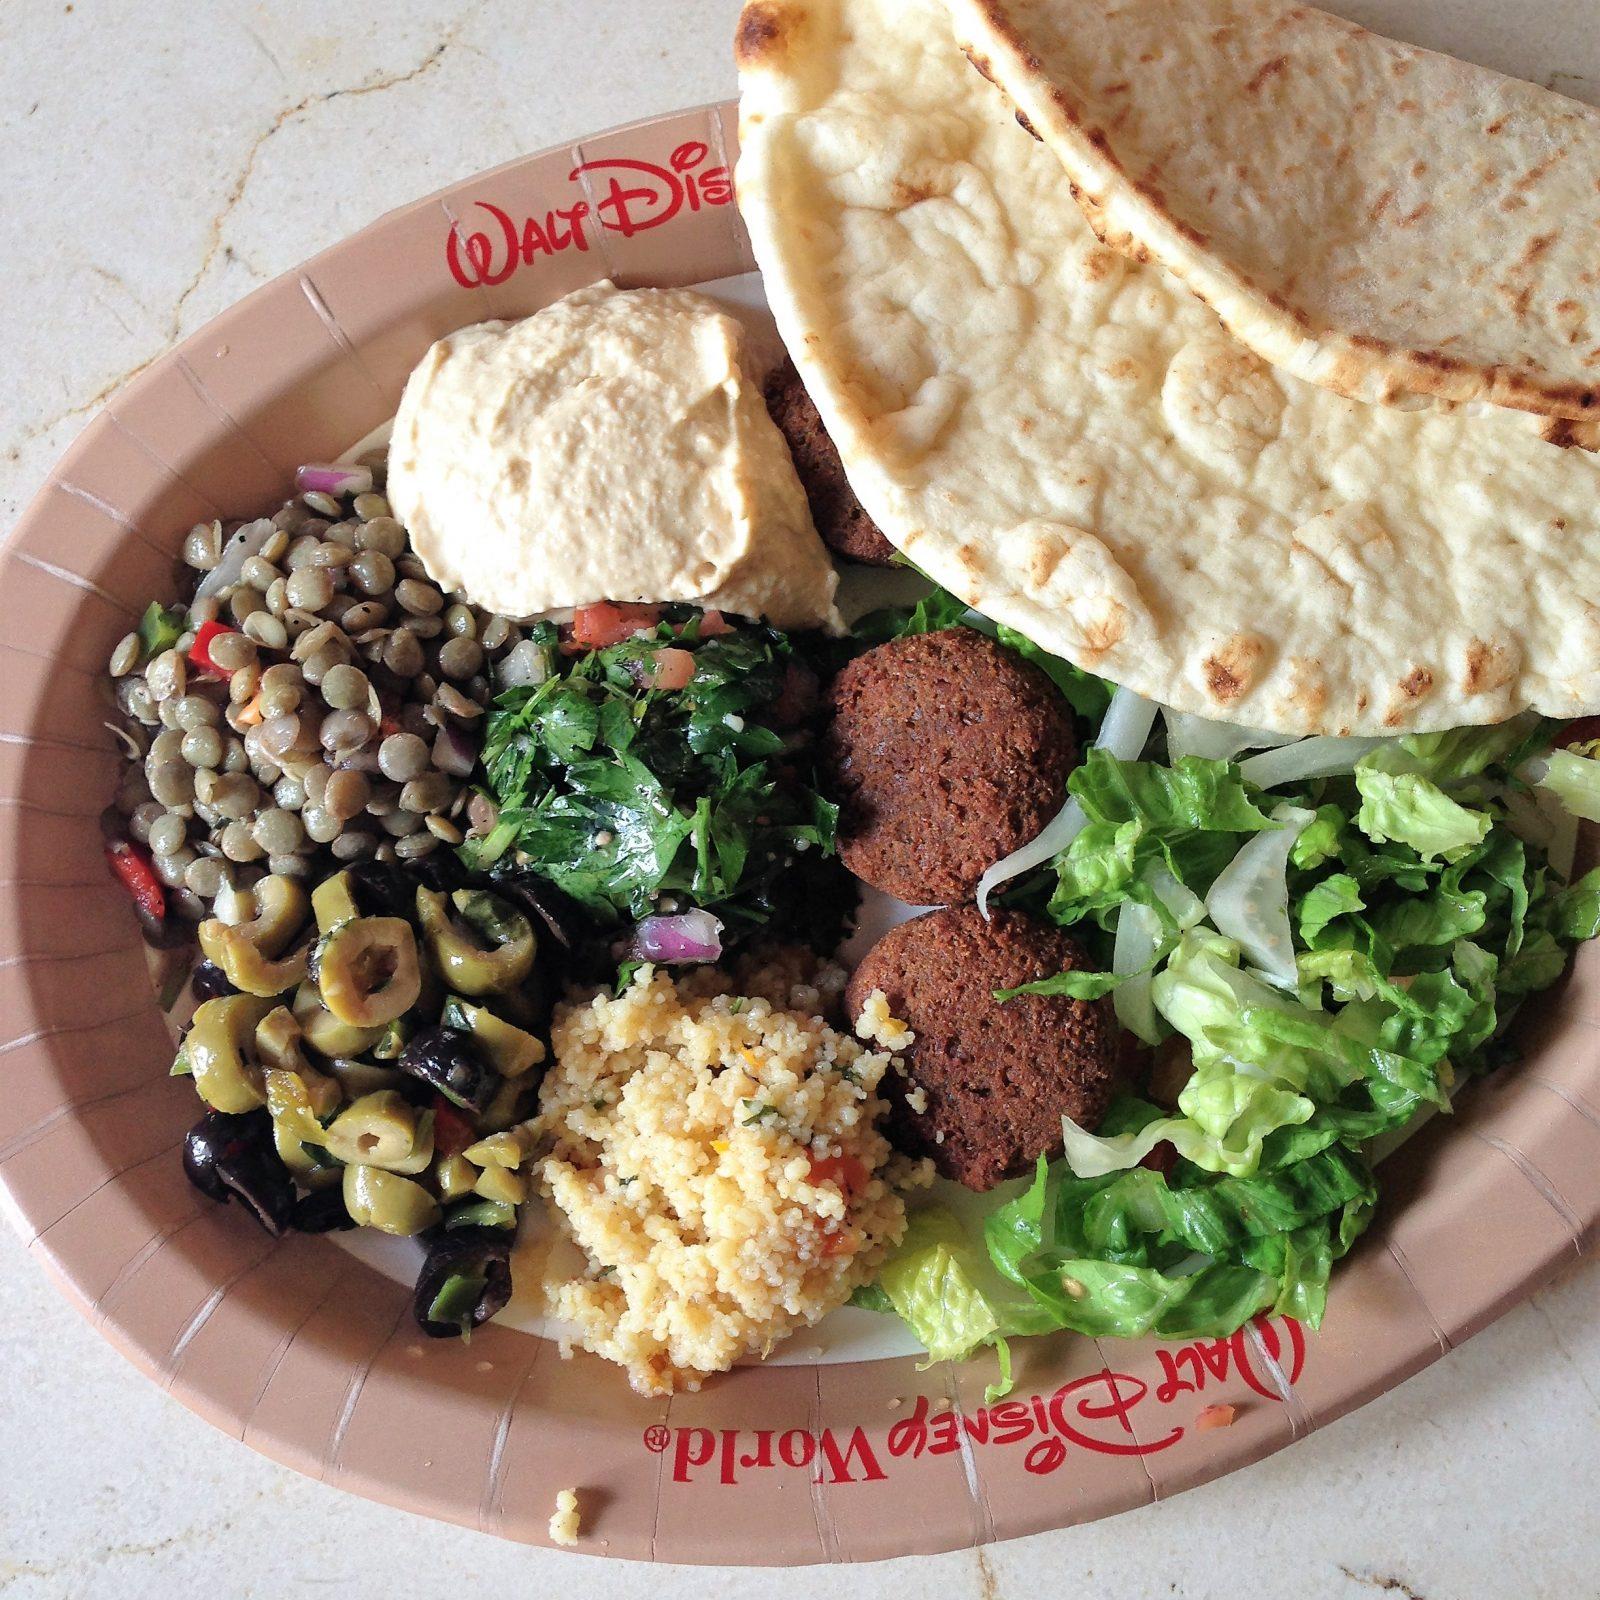 Tangierine Cafe Vegetable Platter